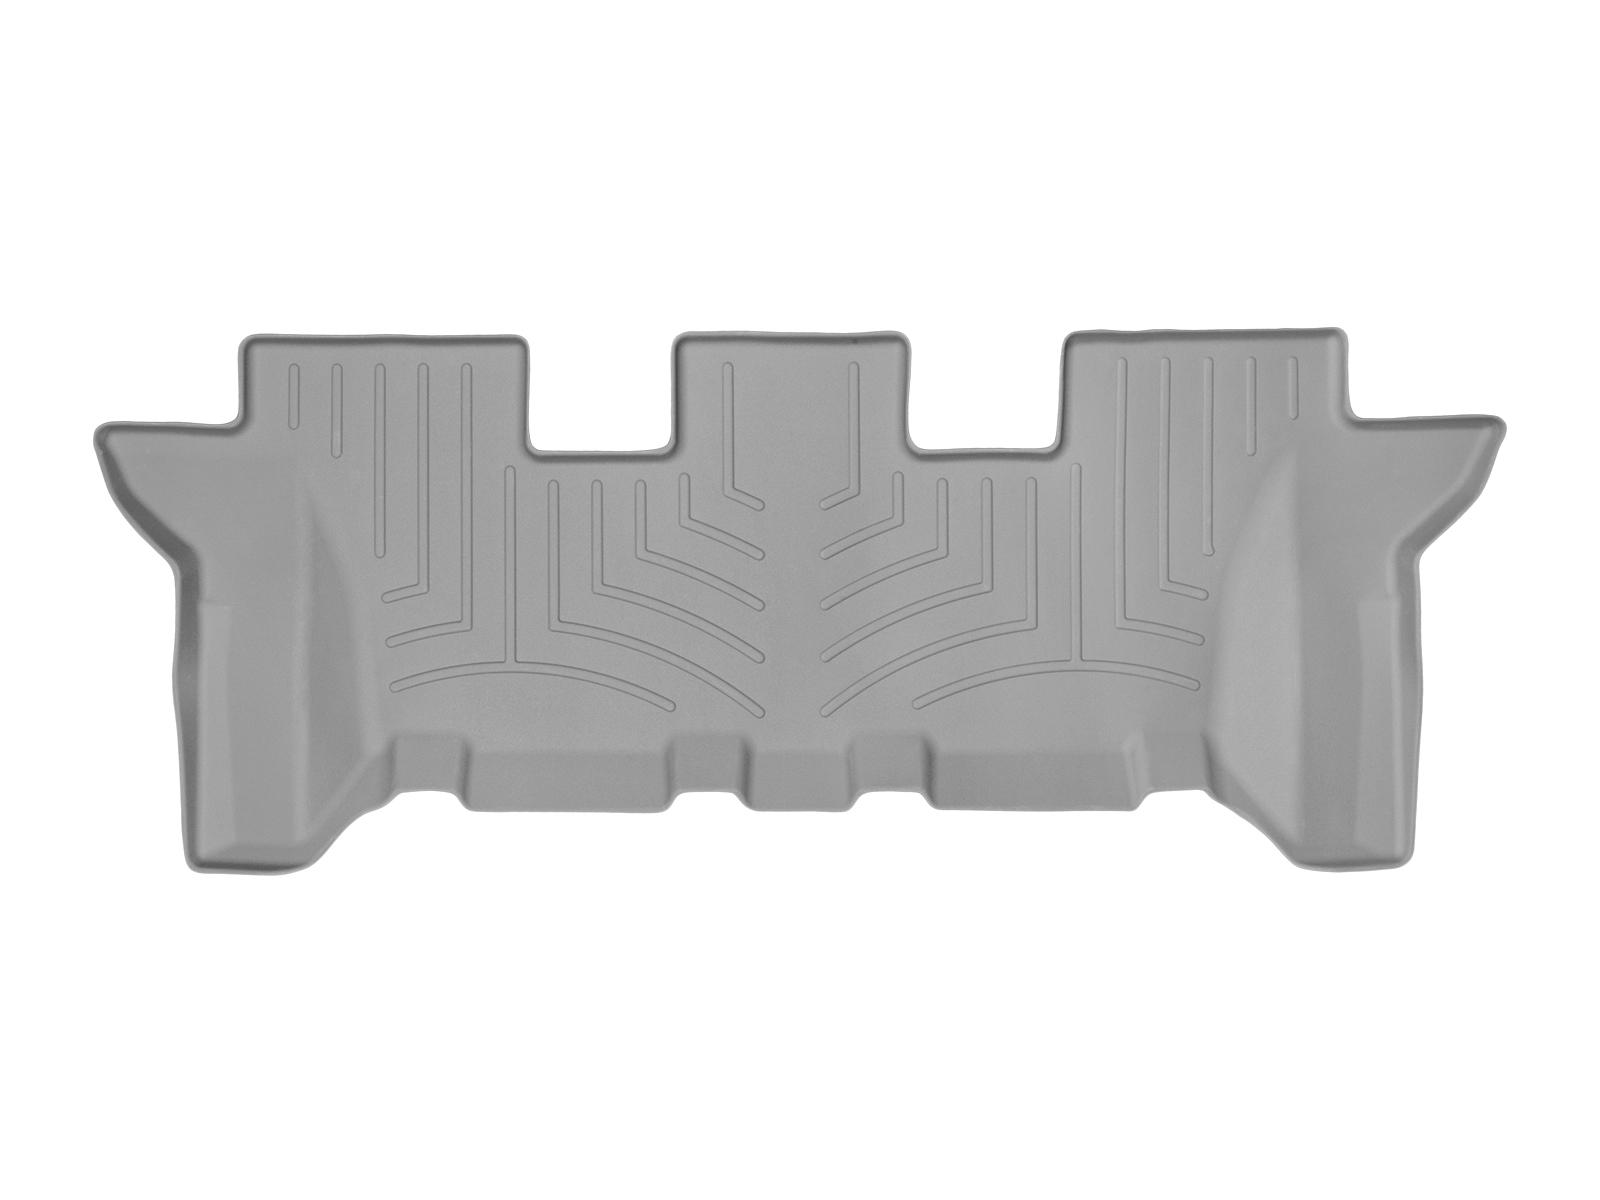 Tappeti gomma su misura bordo alto Kia Sorento 15>15 Grigio A1805*